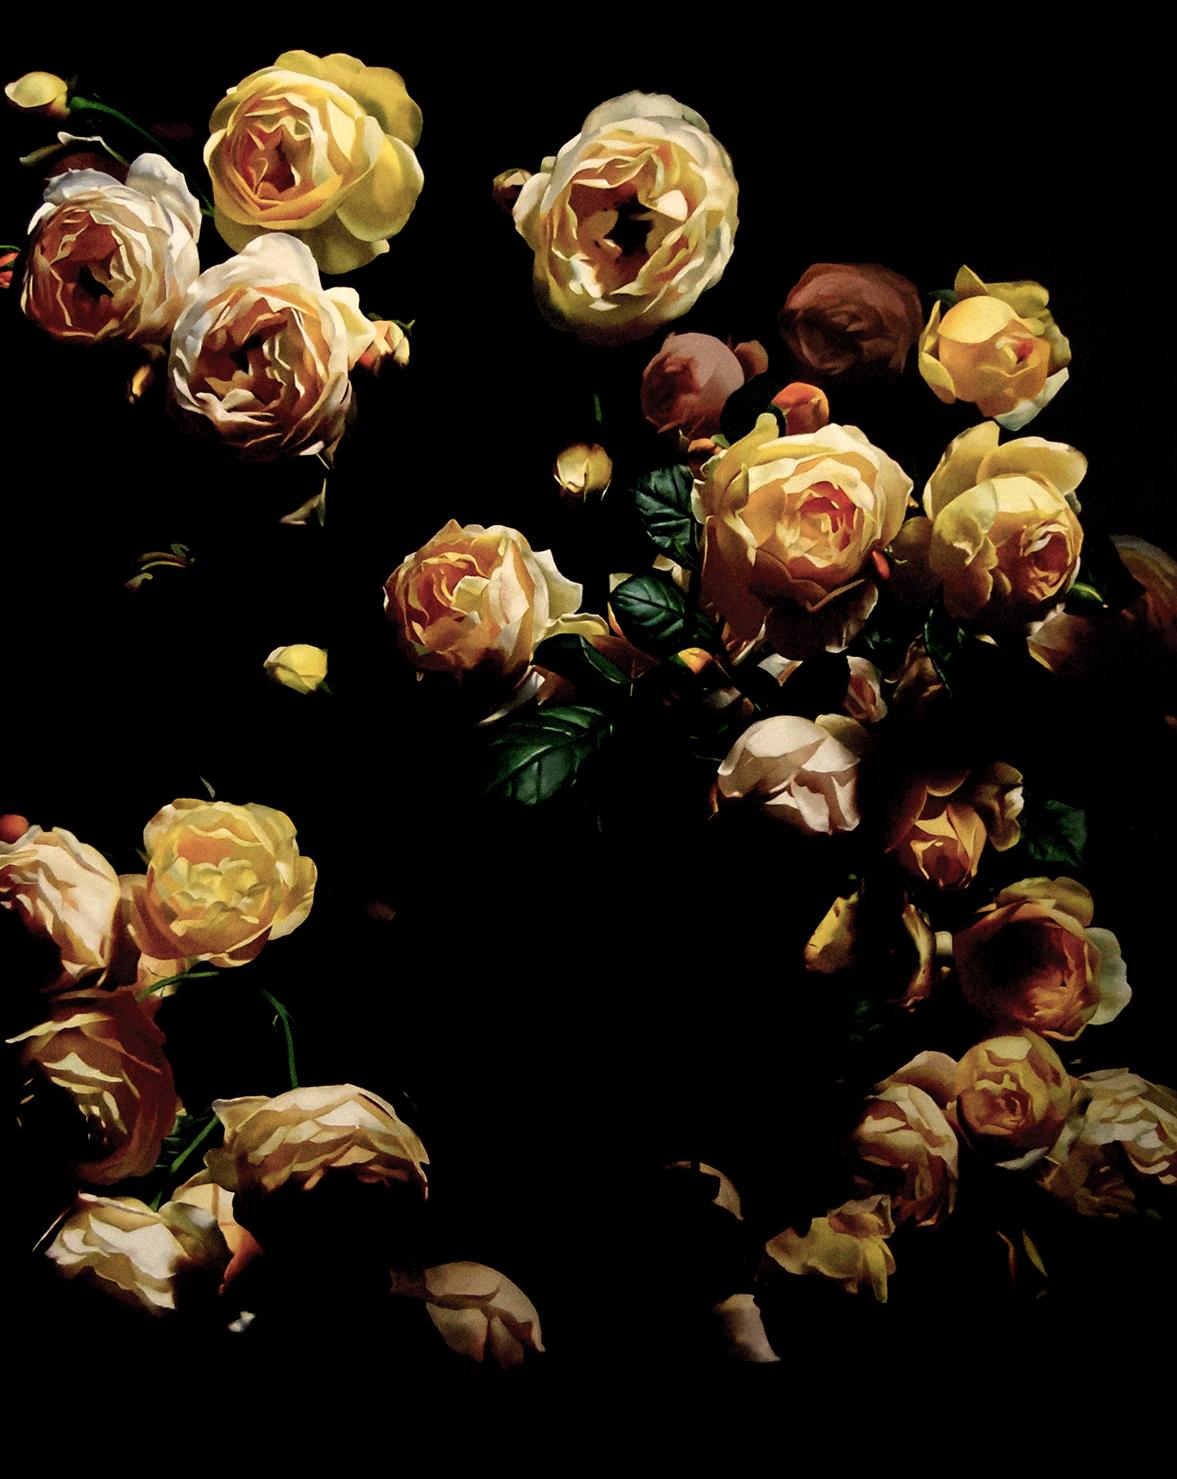 Roses #4